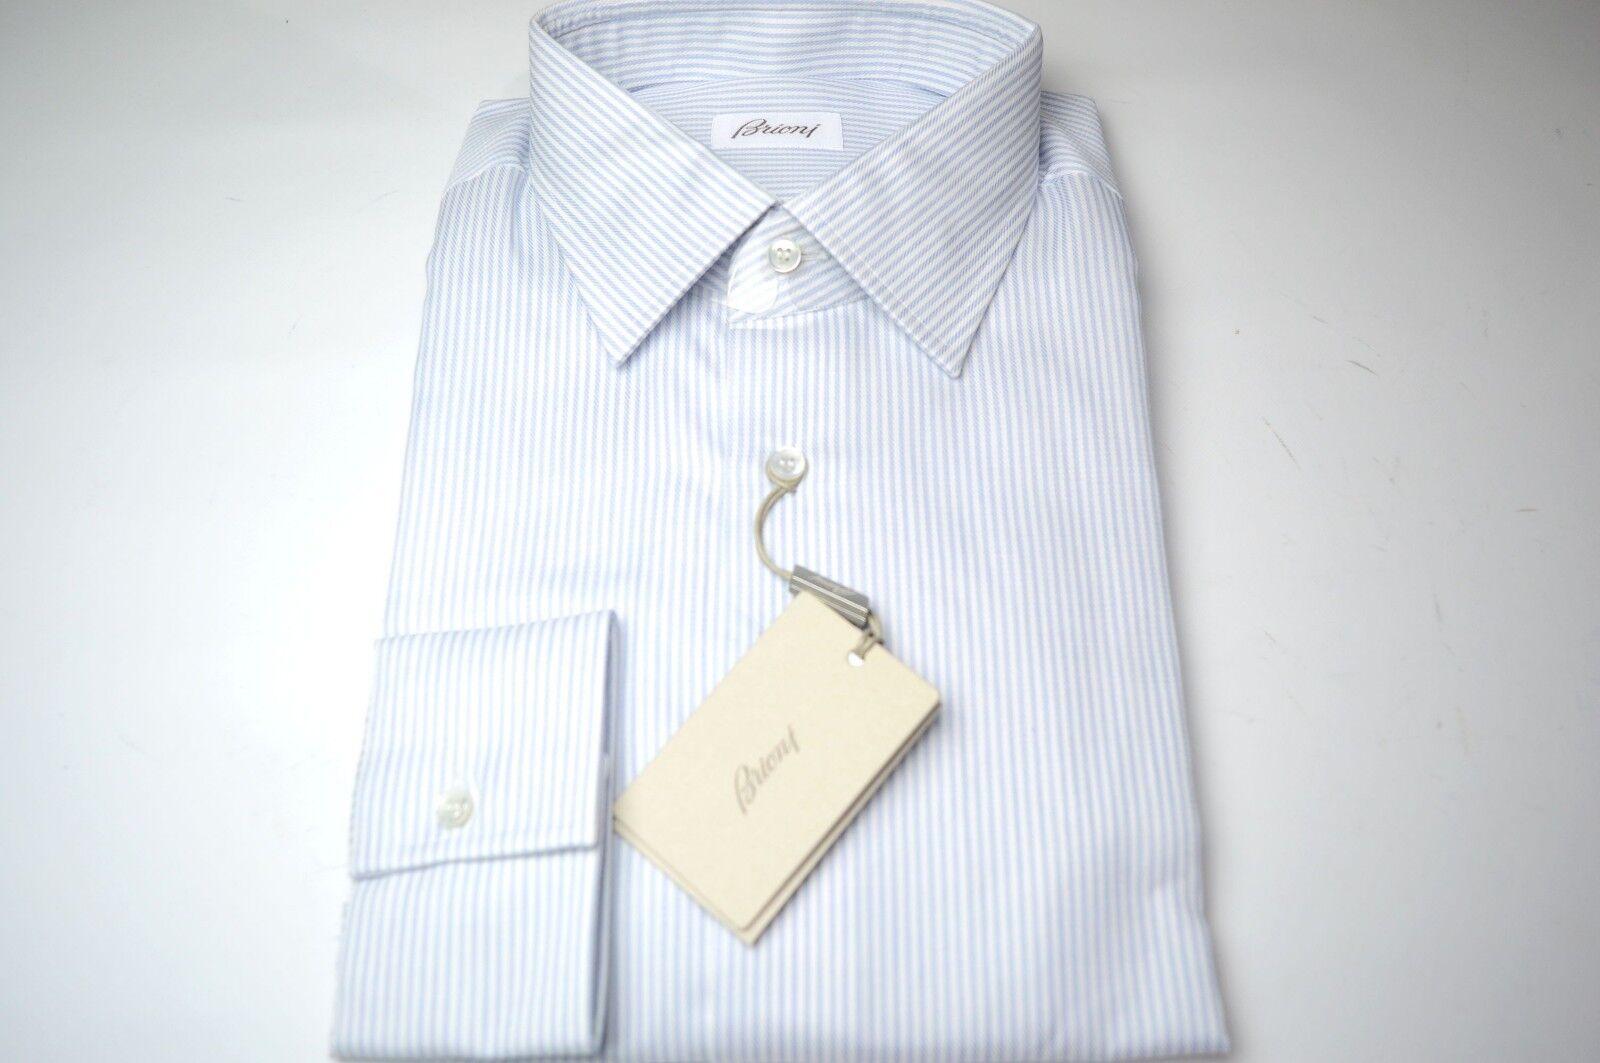 NEW  BRIONI Dress  SHIRT 100% Cotton Größe 16.5 Us 42 Eu  (ARA105)